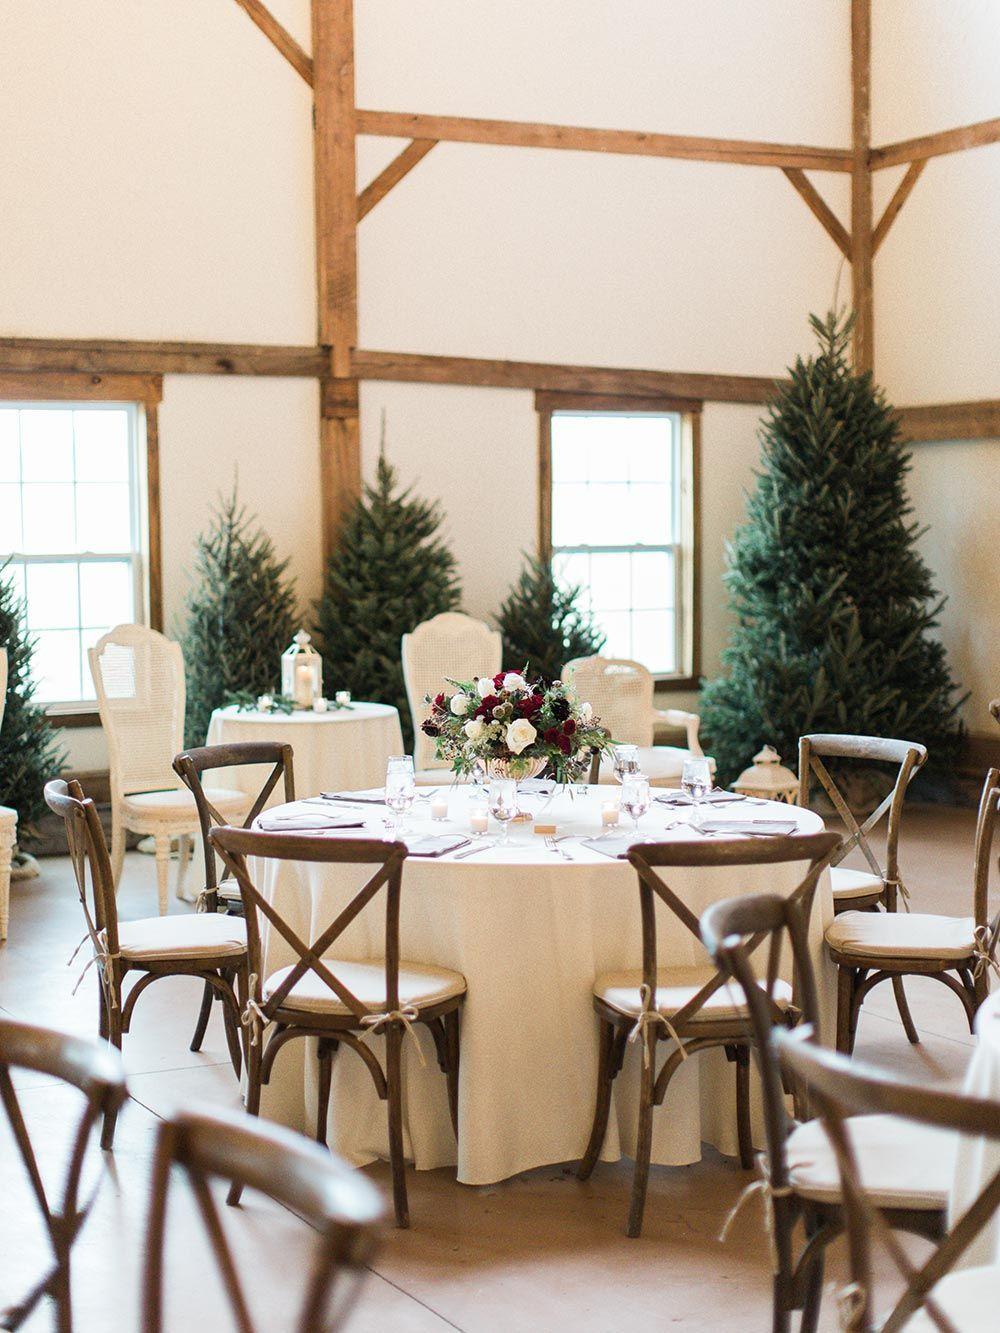 Winter Sunrise Wedding with an Evergreen Brunch Reception ⋆ Ruffled, #BRUNCH #evergreen #Reception #Ruffled #Sunrise #Wedding #Winter